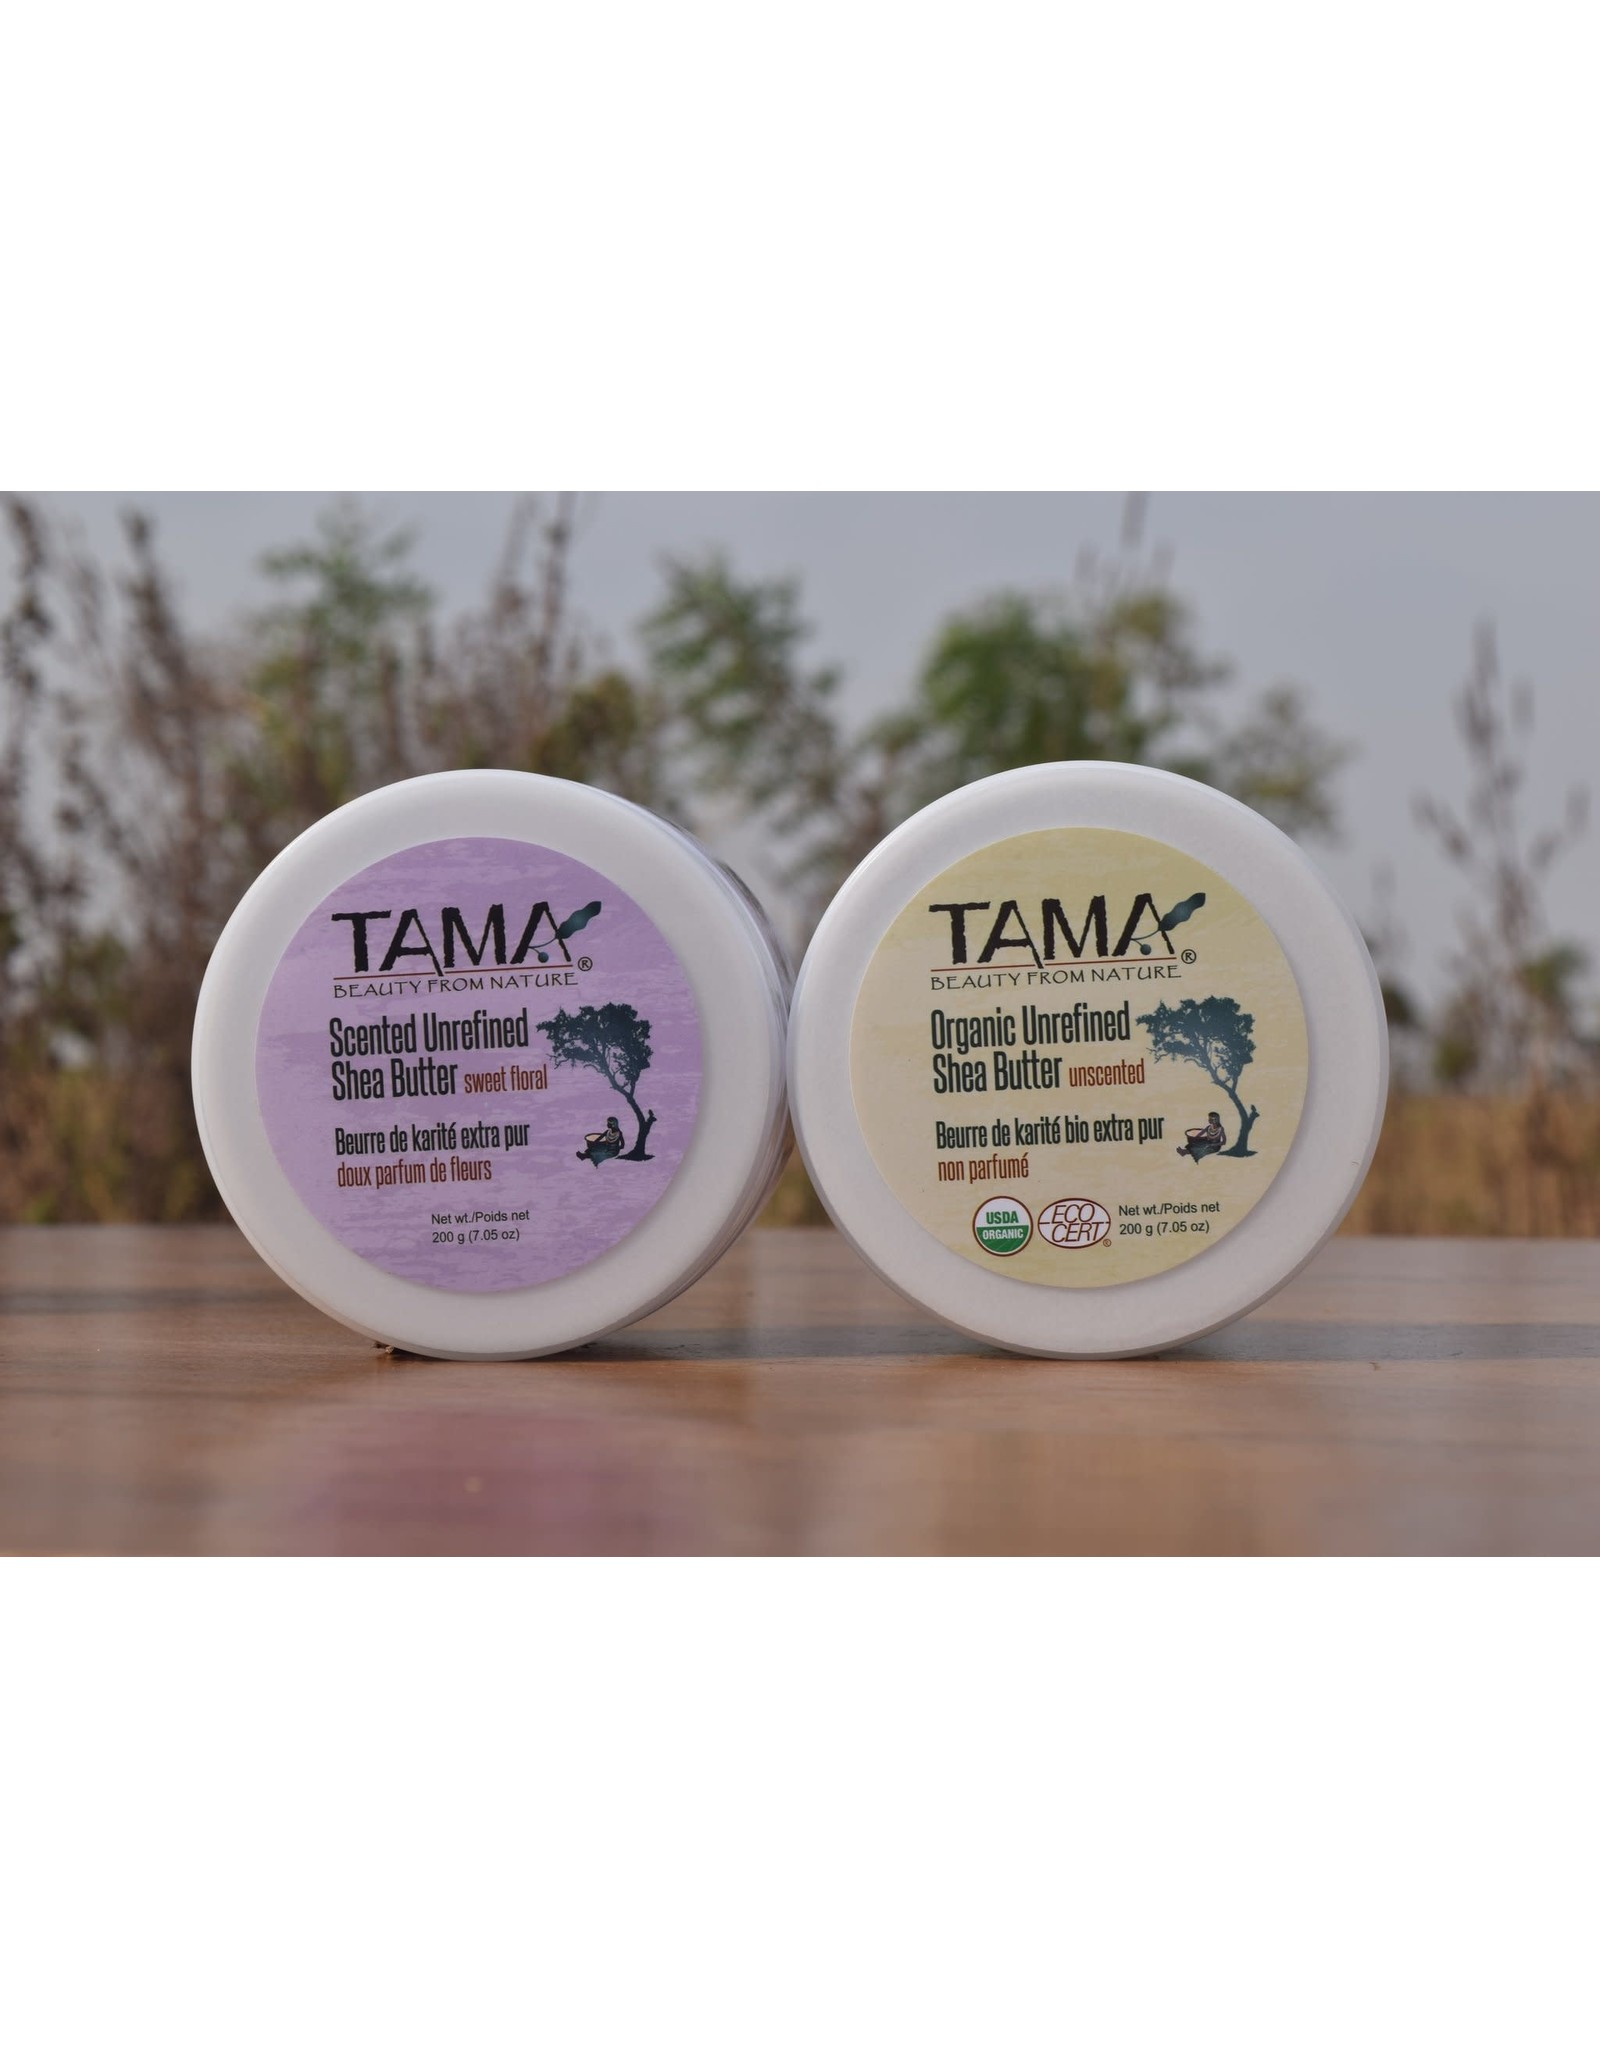 Tama Cosmetics Unrefined Shea Butter, Ghana